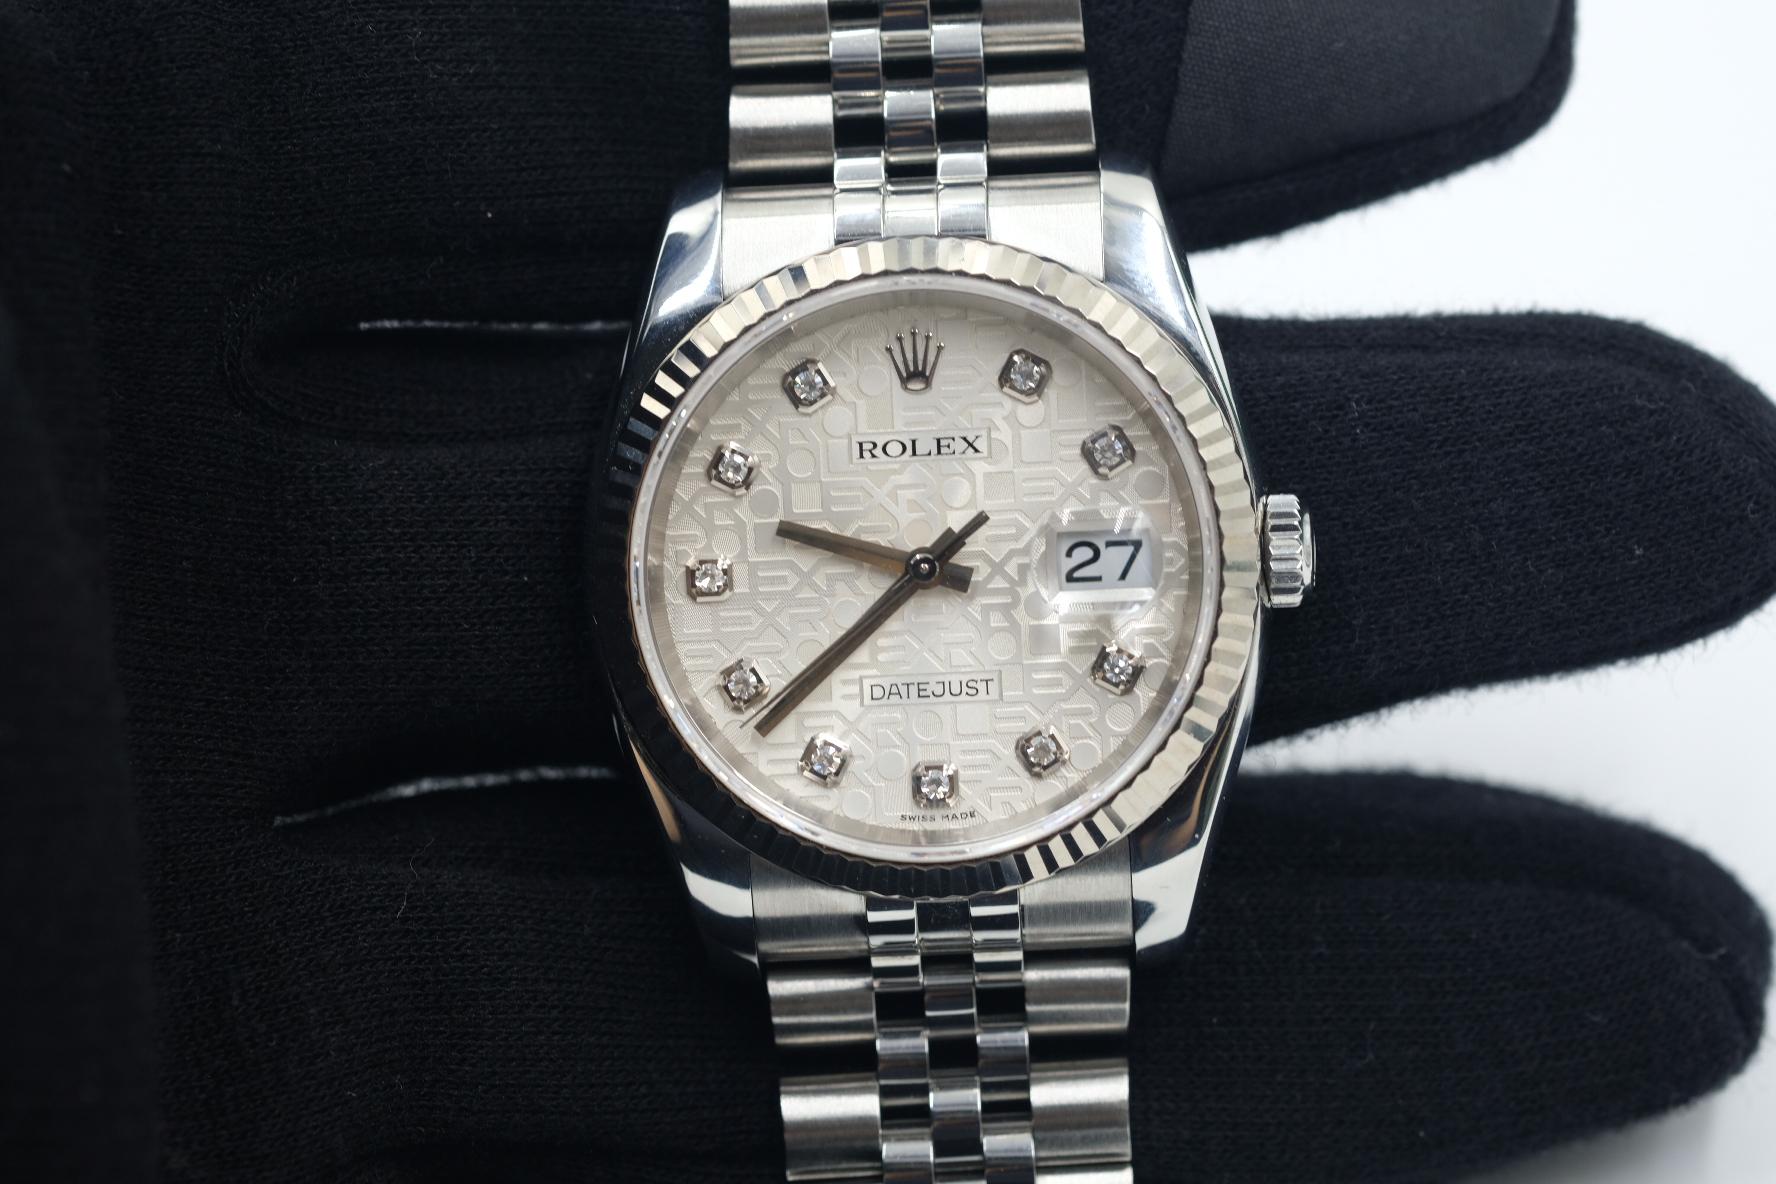 Đồng hồ Rolex Date Just 116234